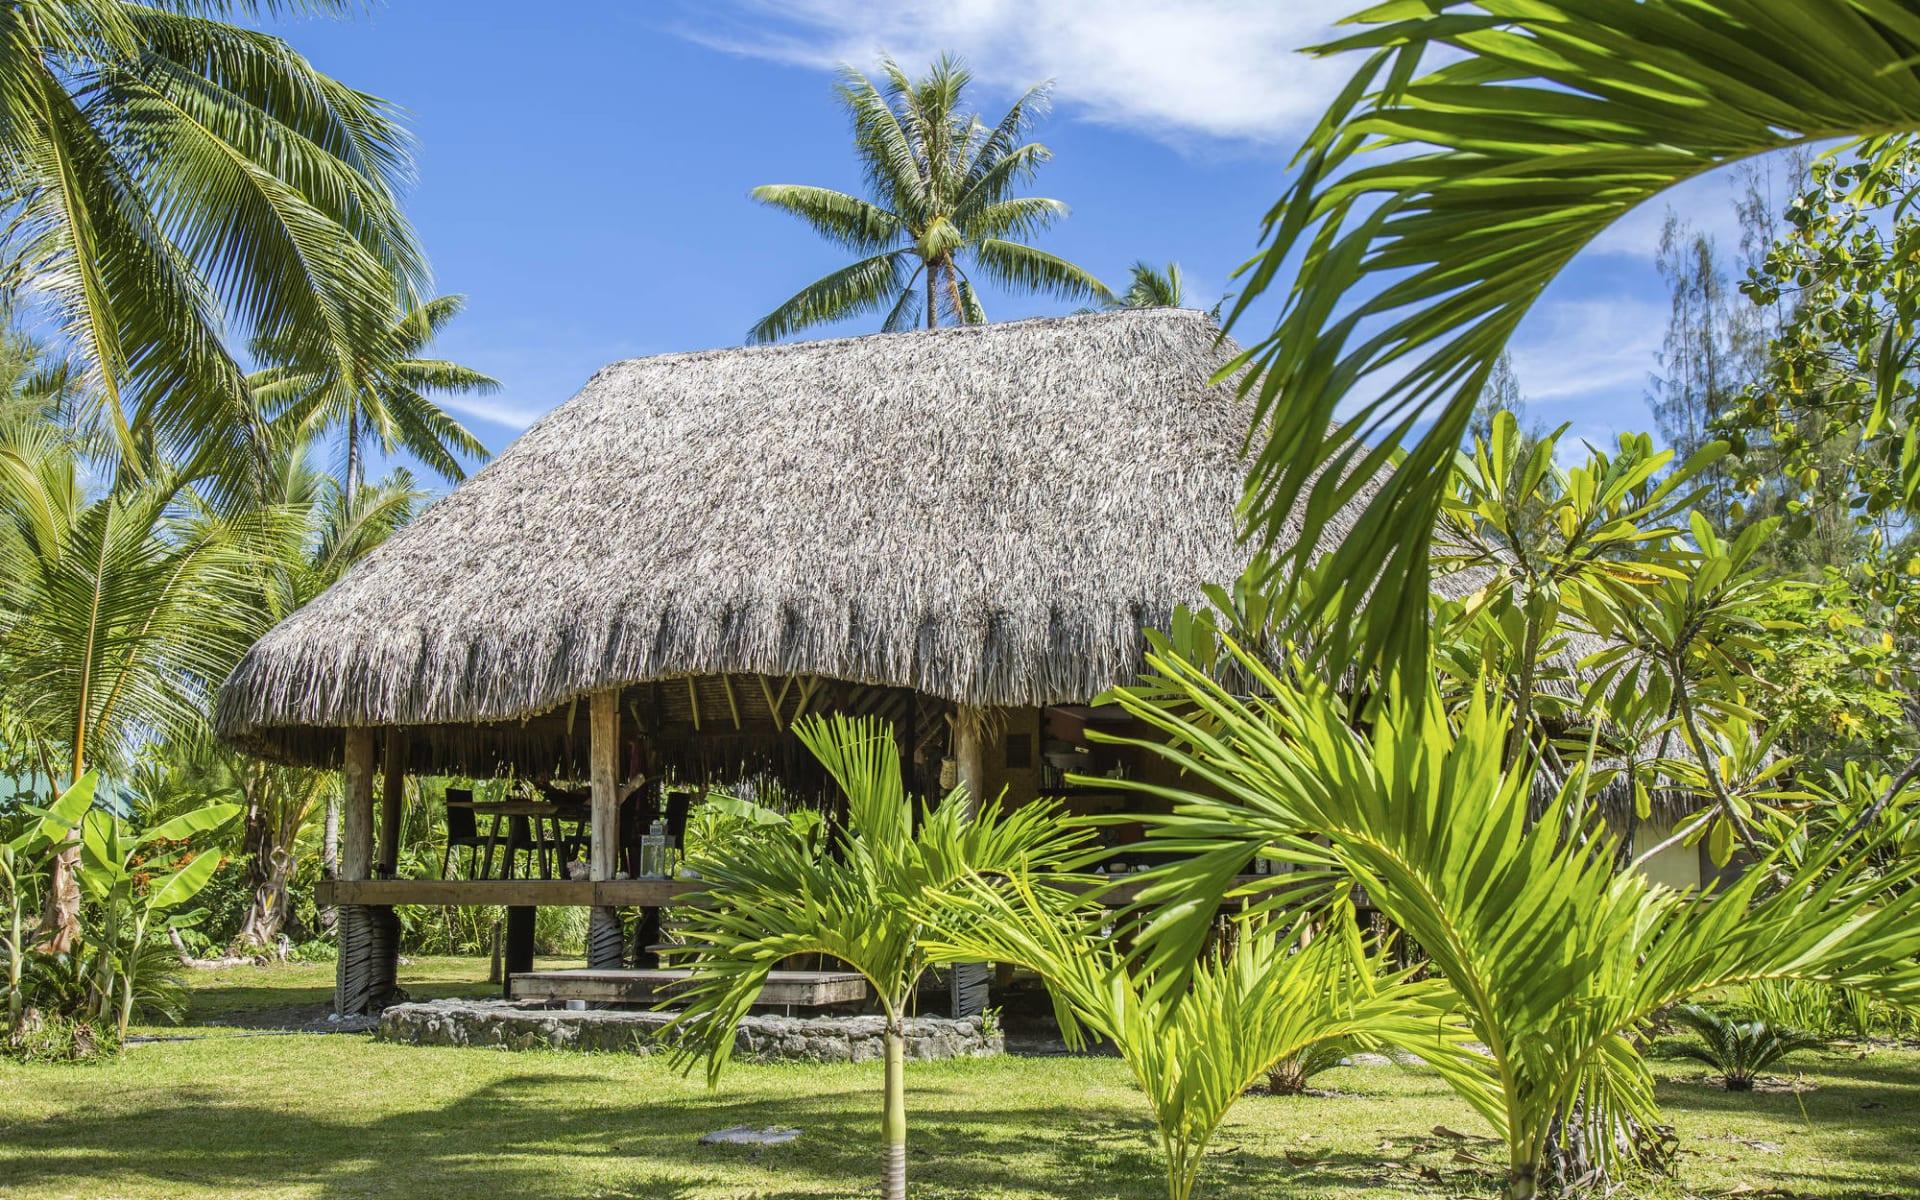 Pension Alice et Raphael in Bora Bora:  BOB Pension Alice et Raphael (cpr M.Brightwell) (11)